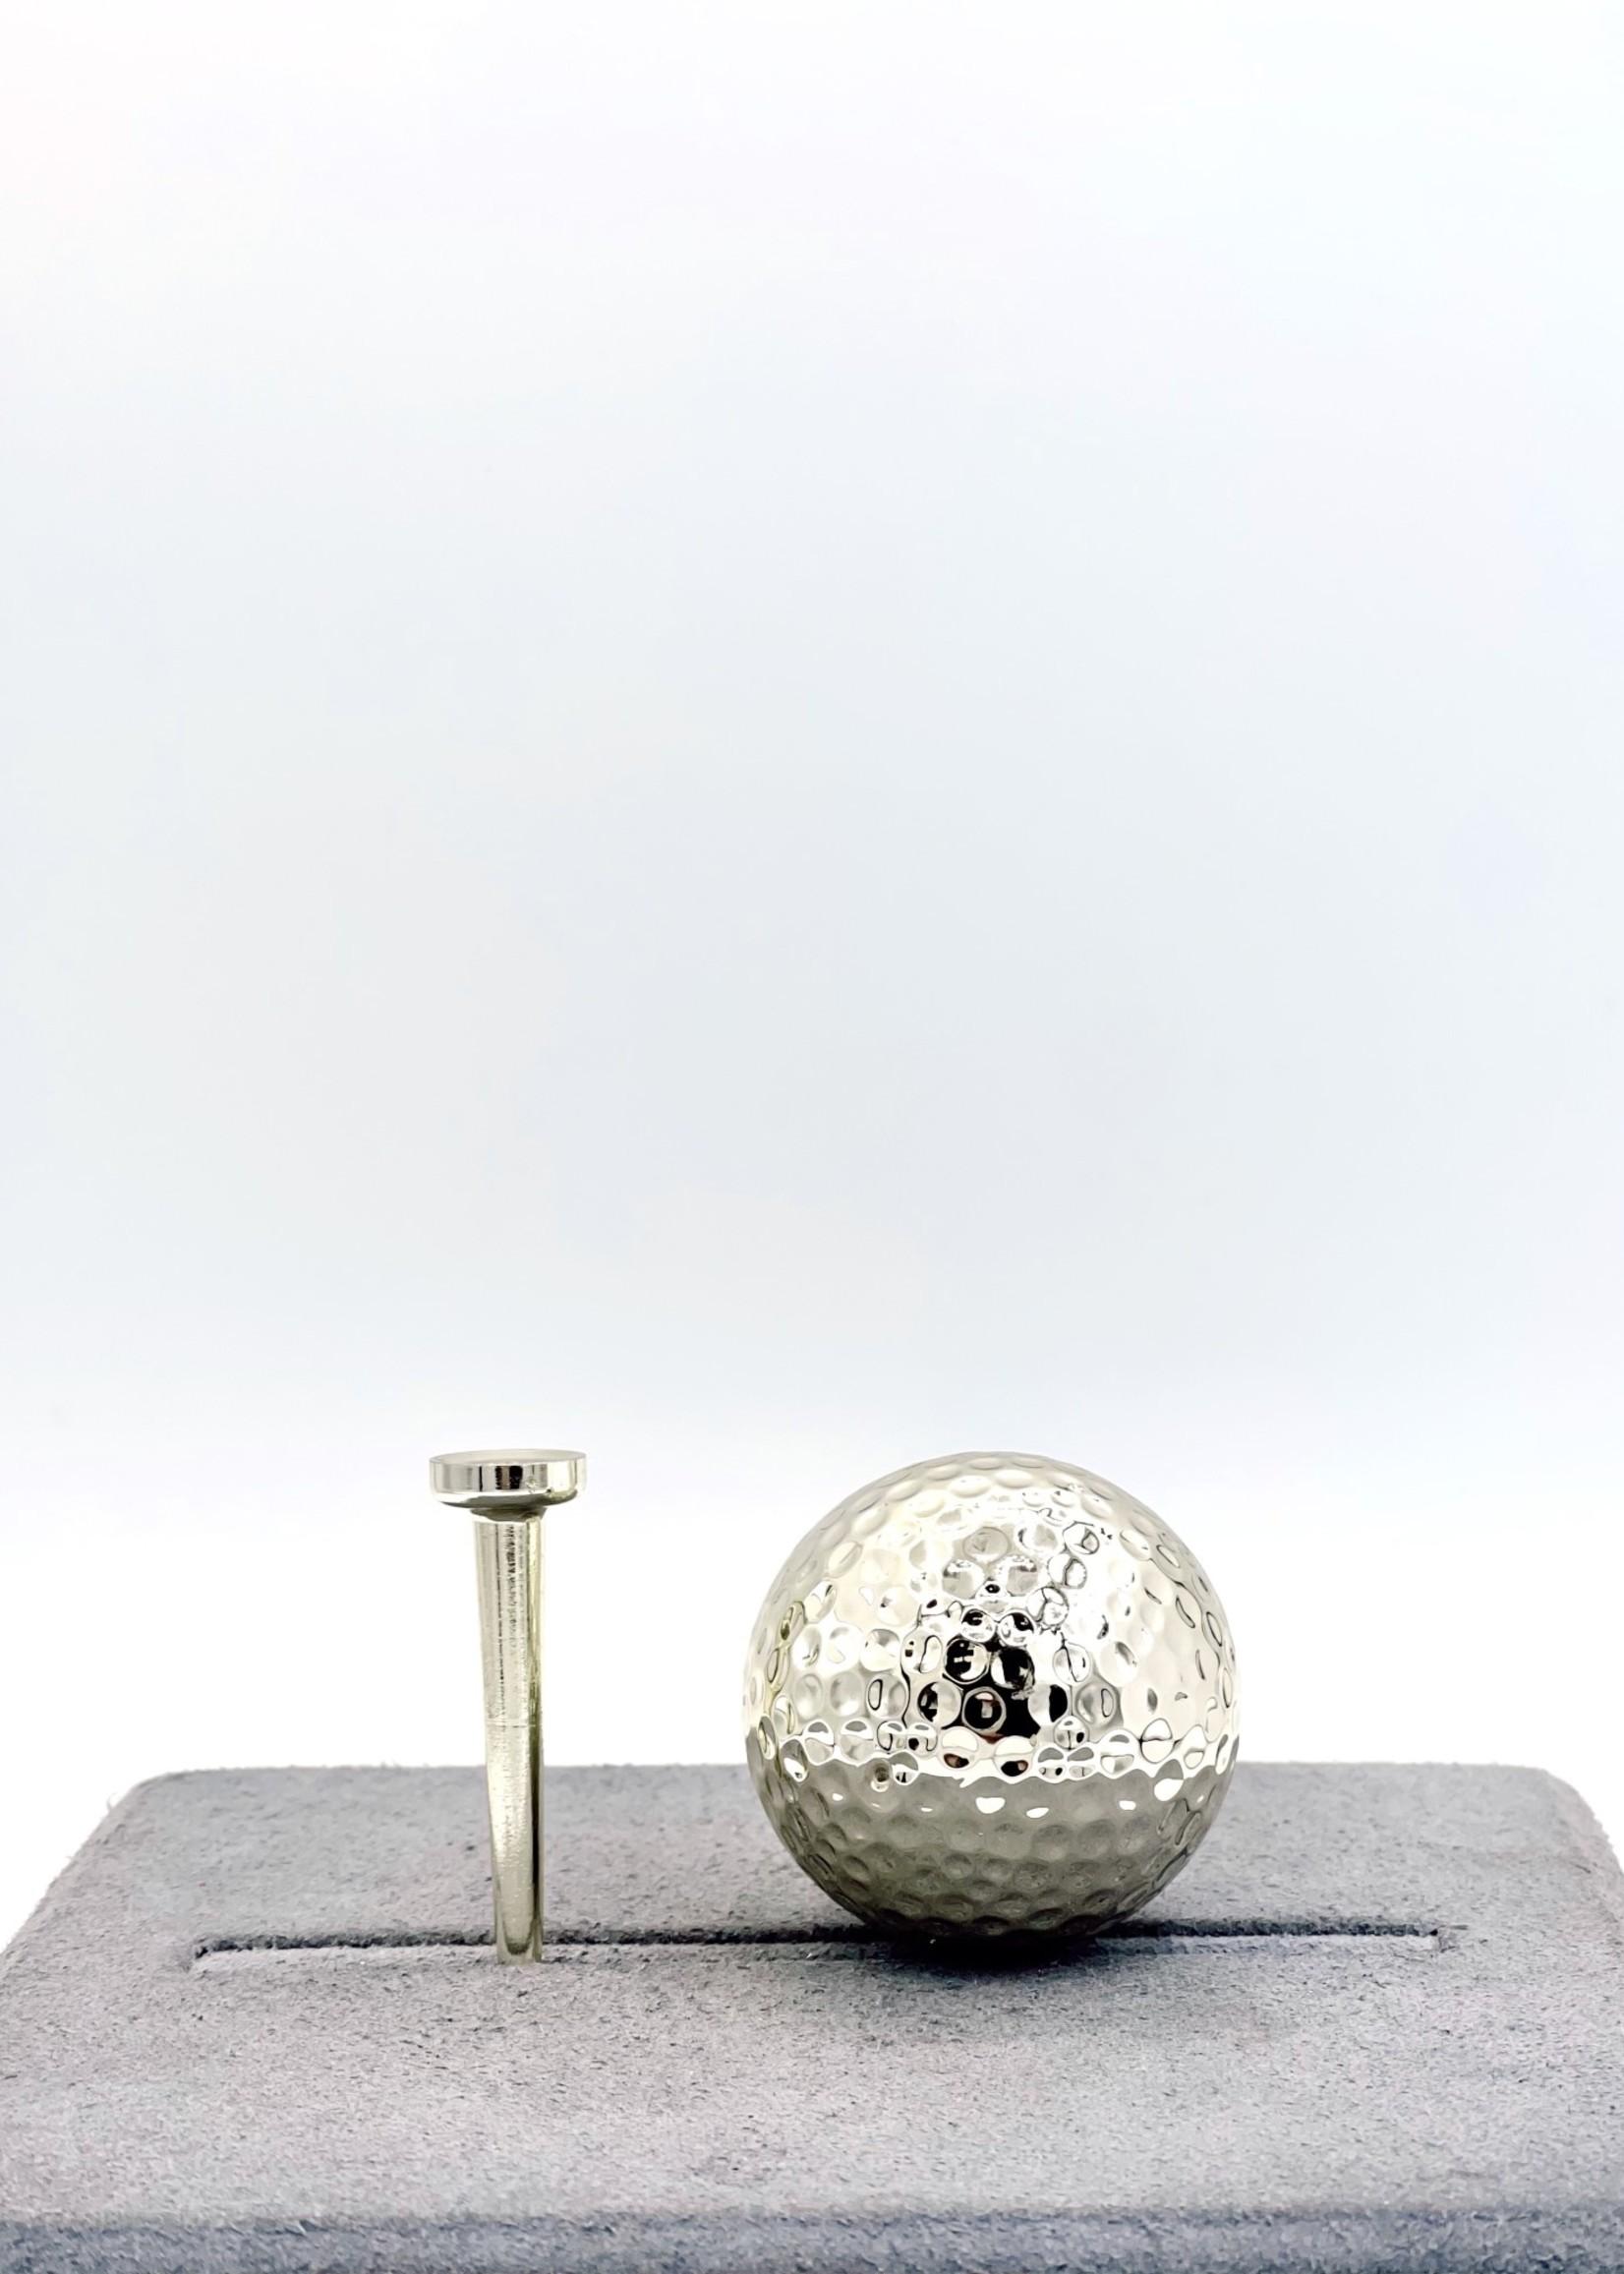 24k Rose & Loyalty Co. Golf Ball & Tee 24KP